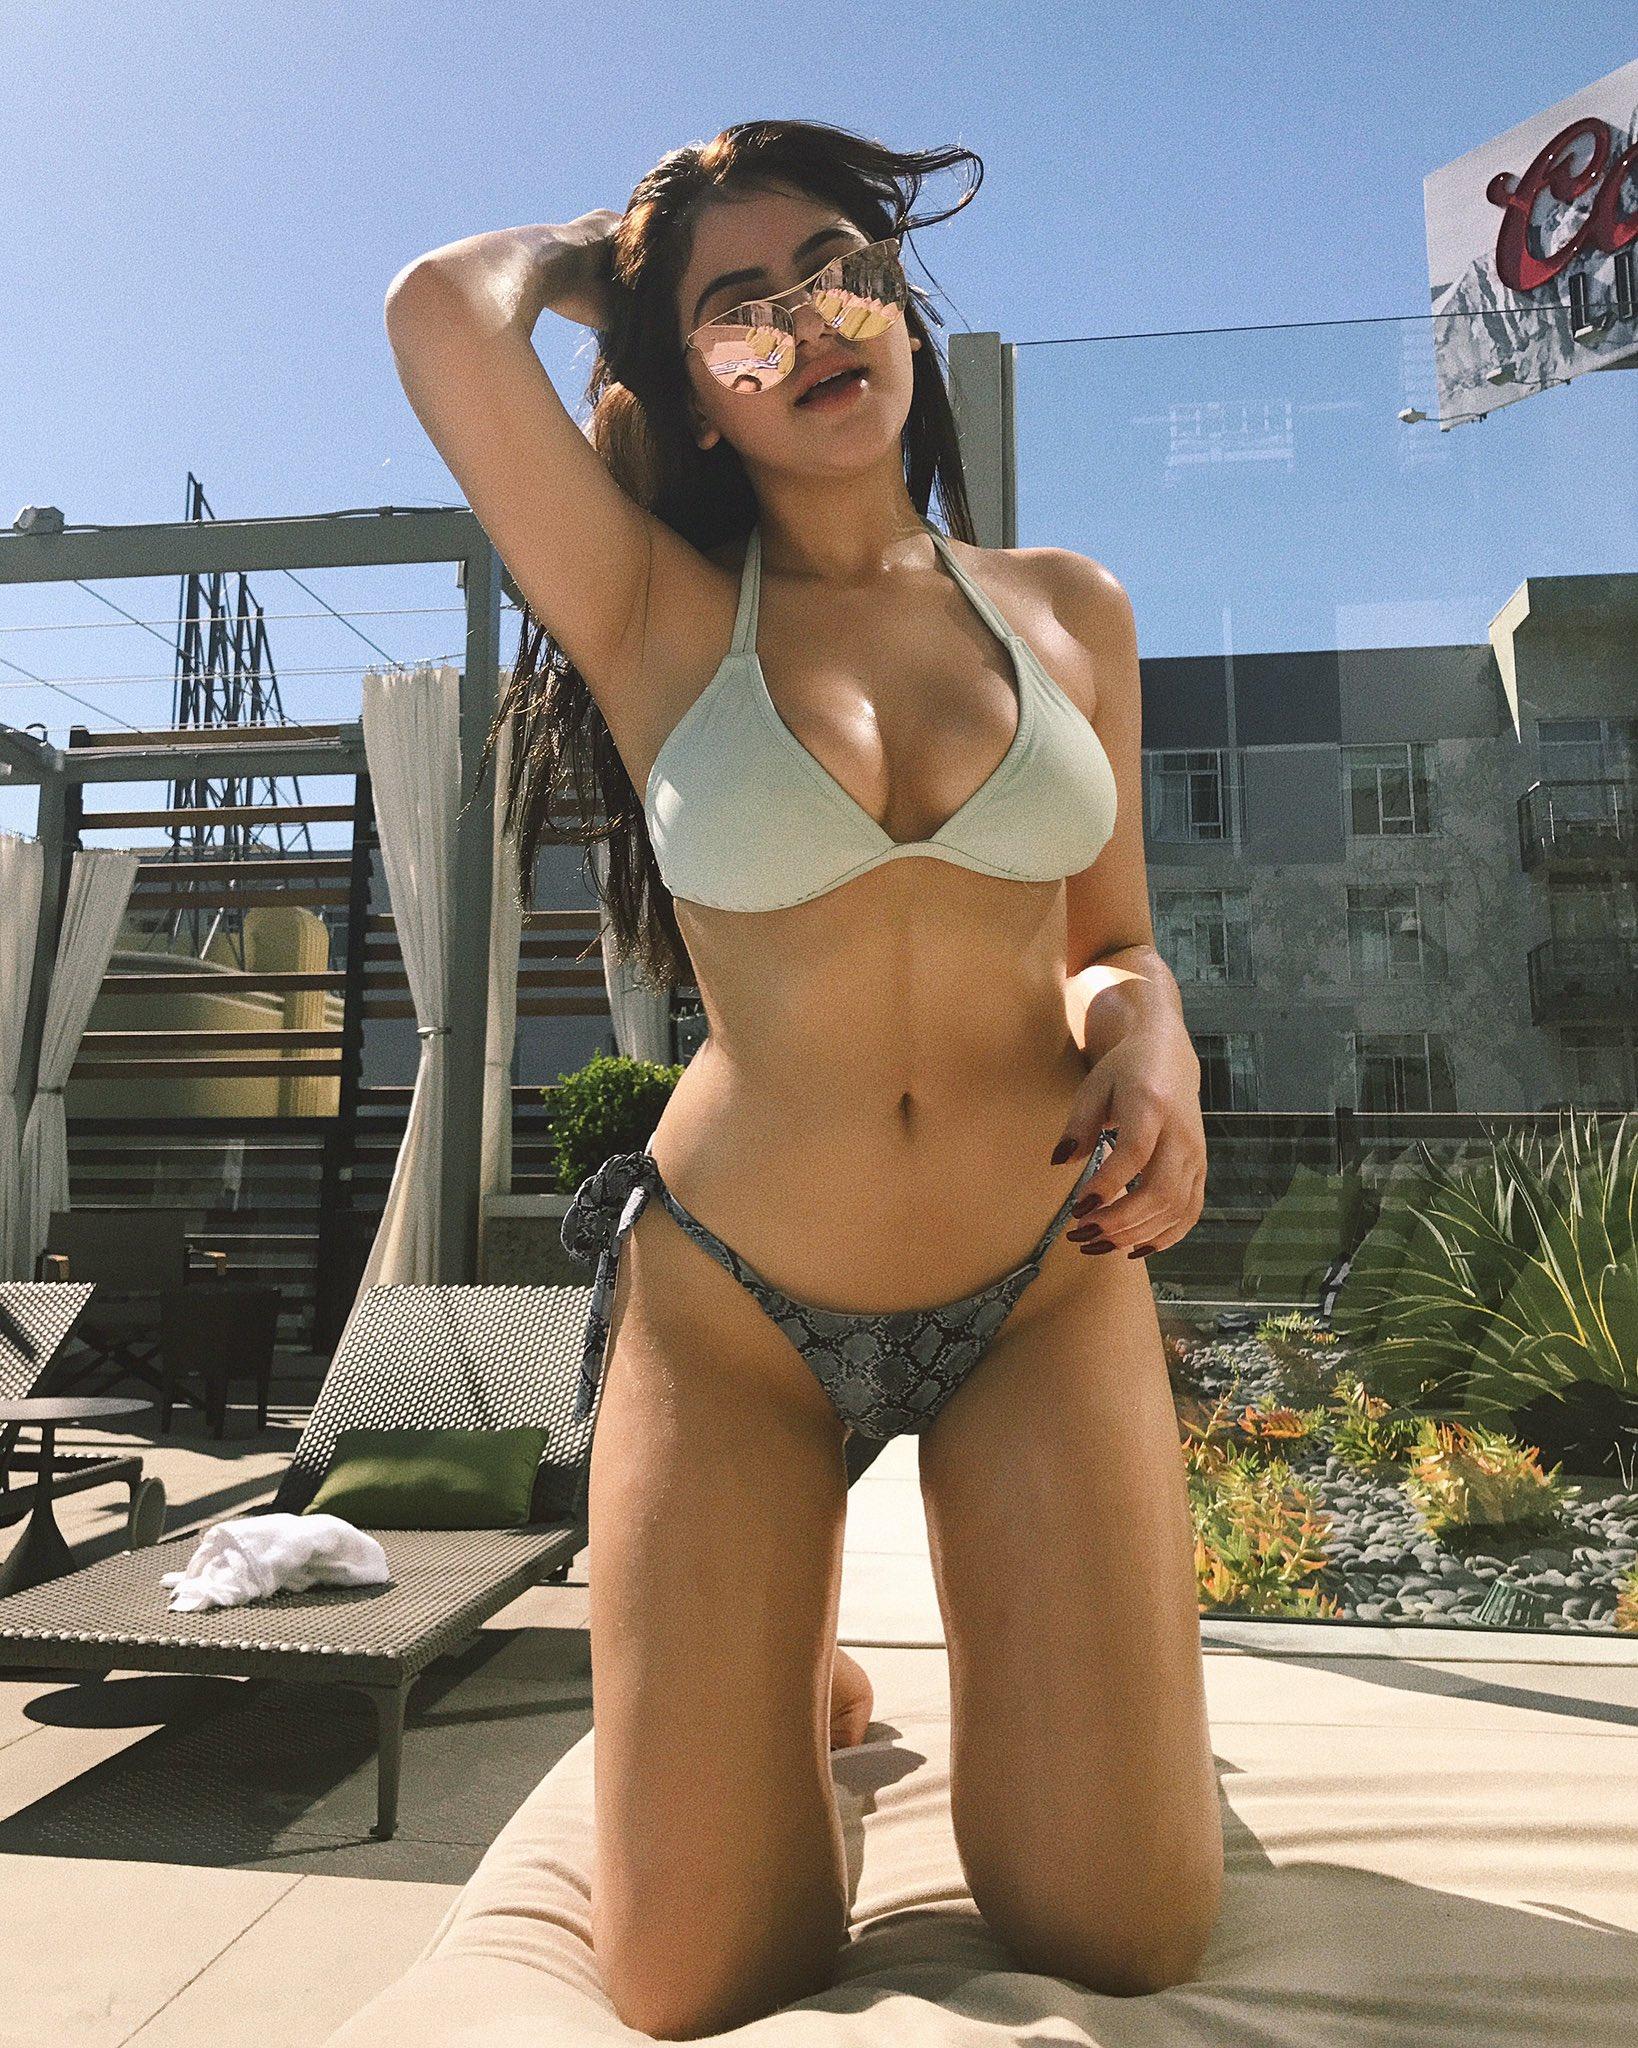 Lauren Giraldo Hot Social Media Pics -26